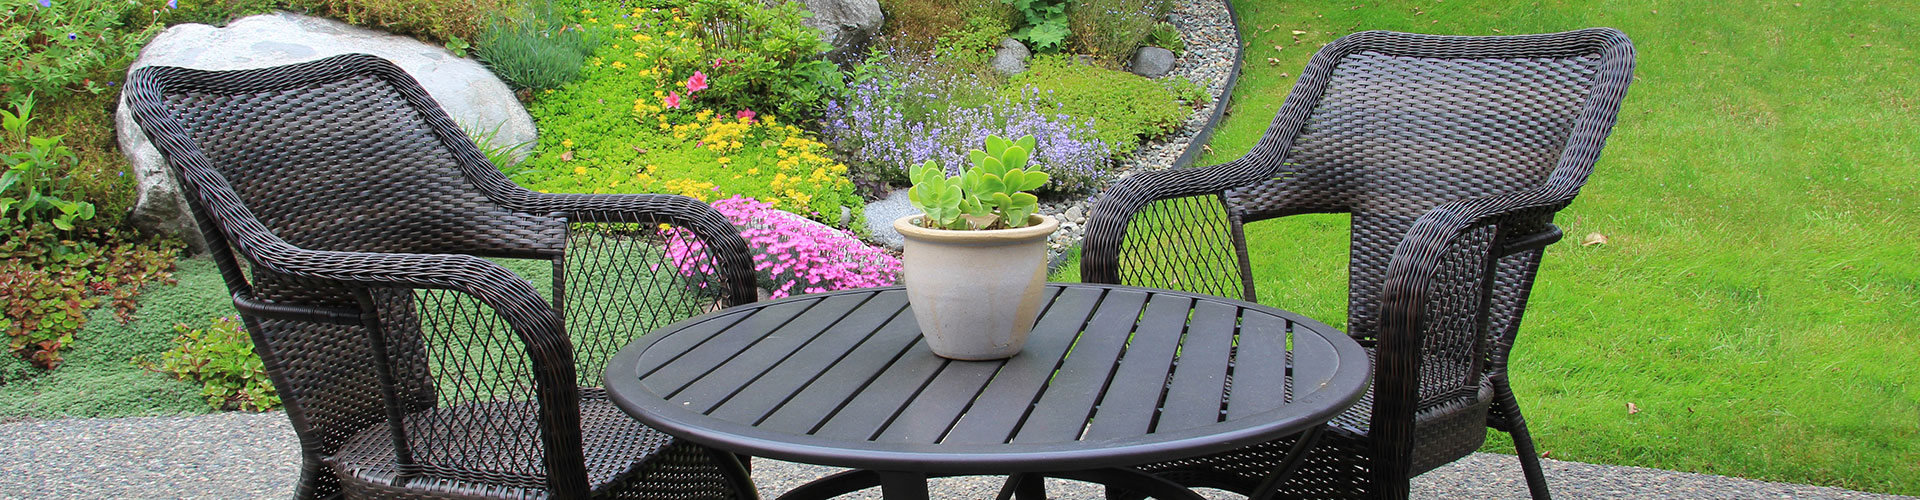 backyard flagstone patio with garden furniture